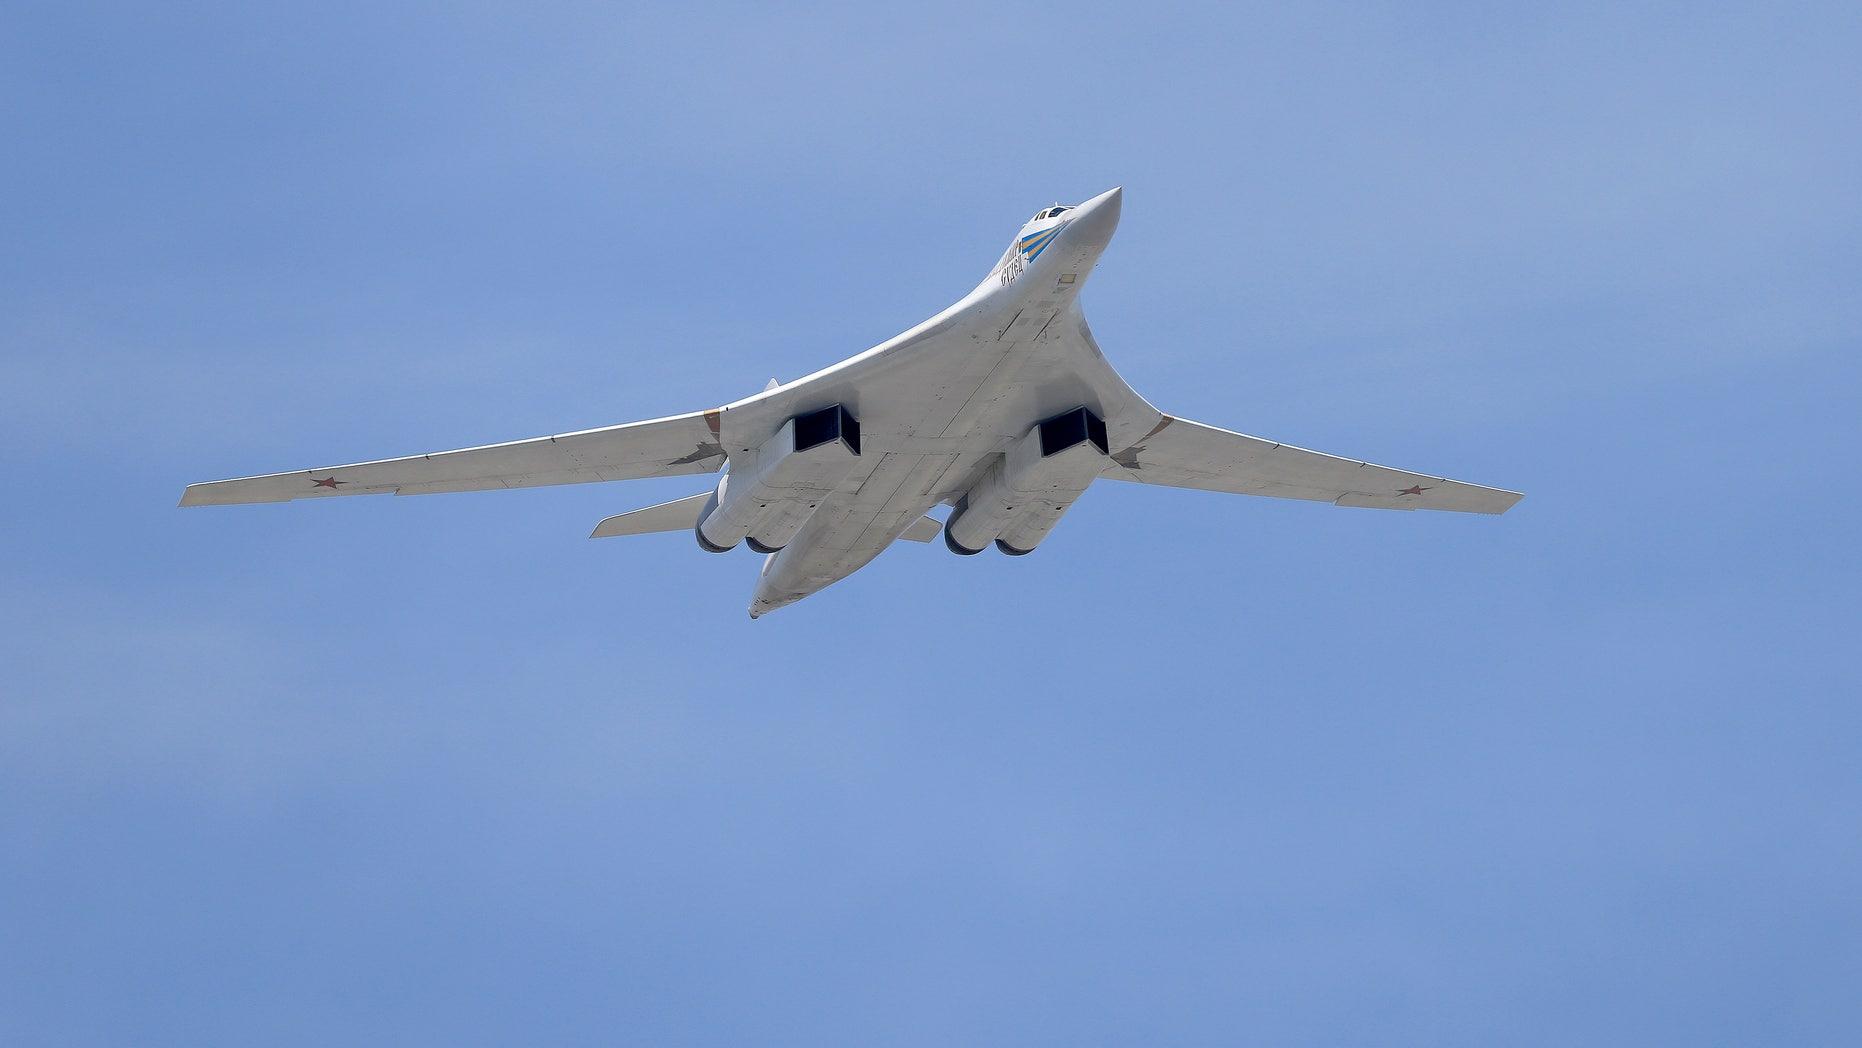 A Tu-160 Blackjack strategic bomber.